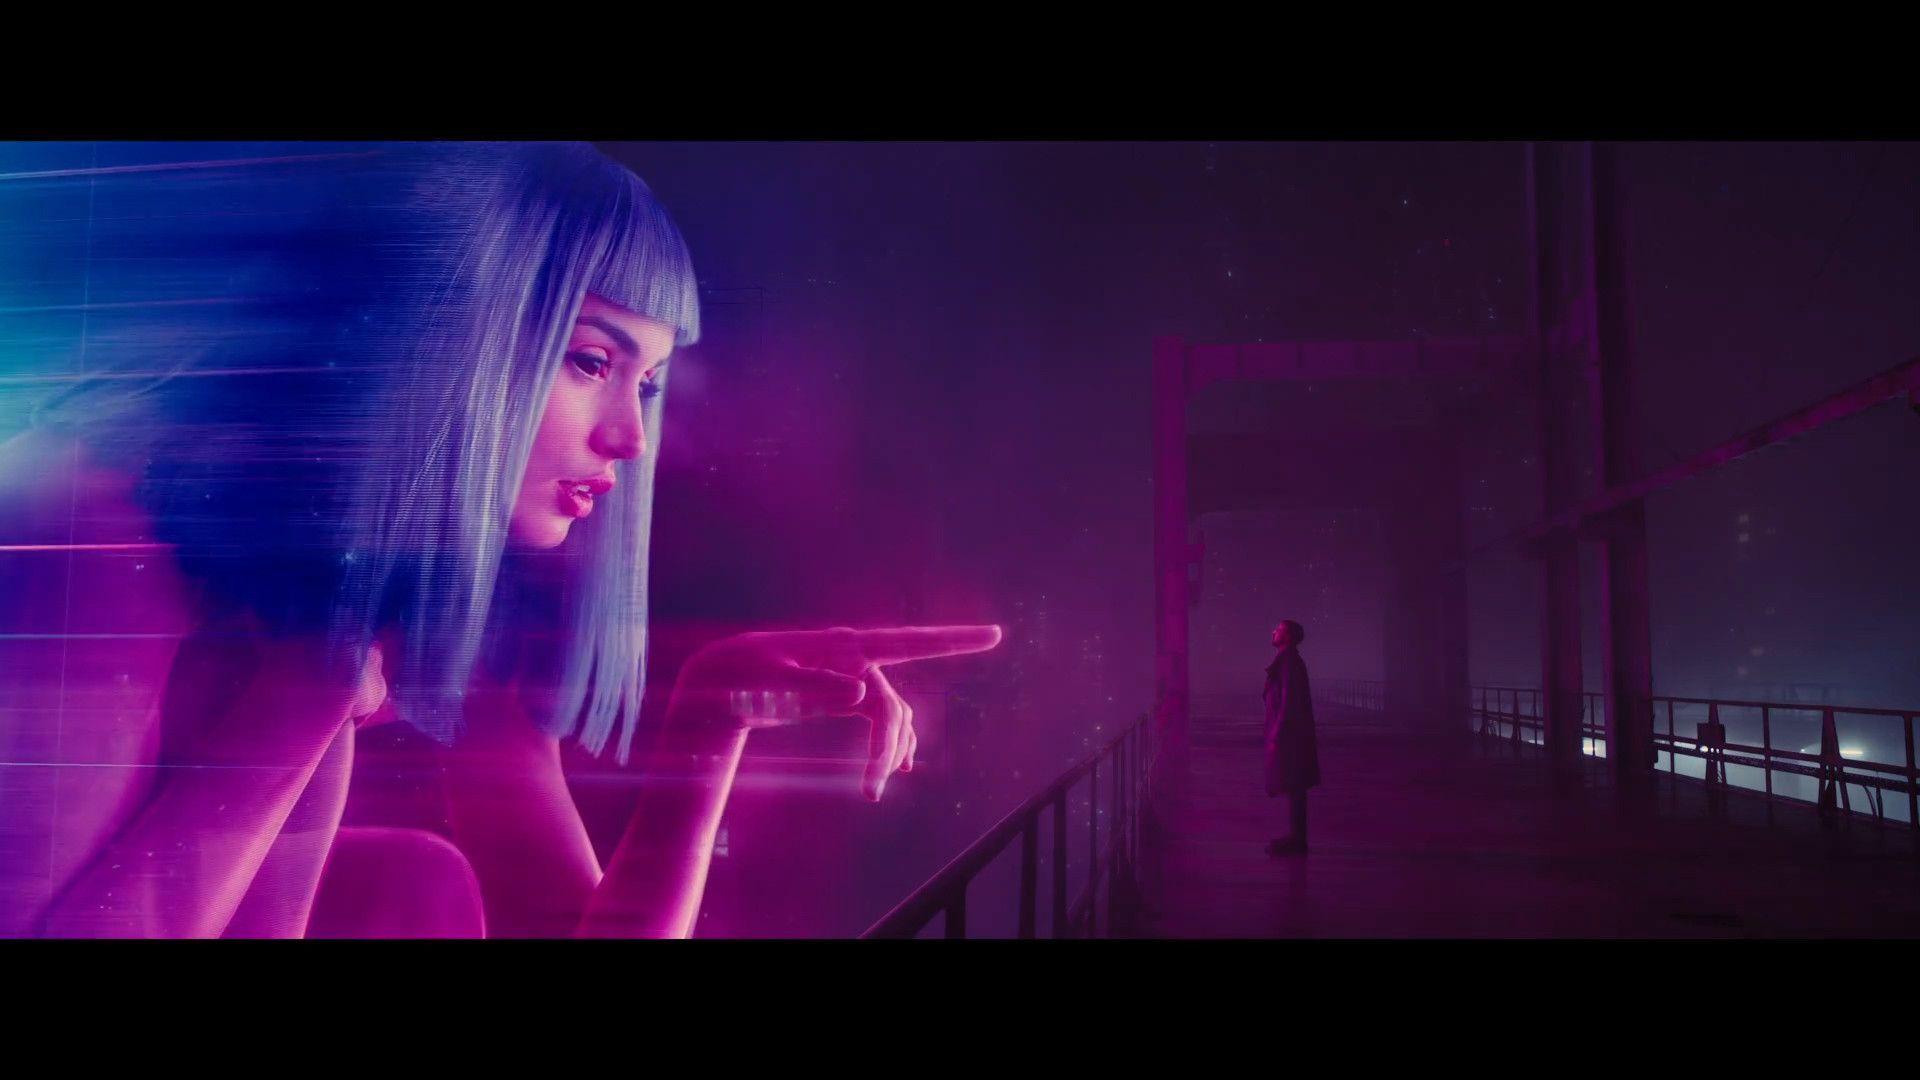 1920x1080 Blade Runner 2049 Trailer Wallpapers Direcao De Fotografia Blade Runner Cena De Filme